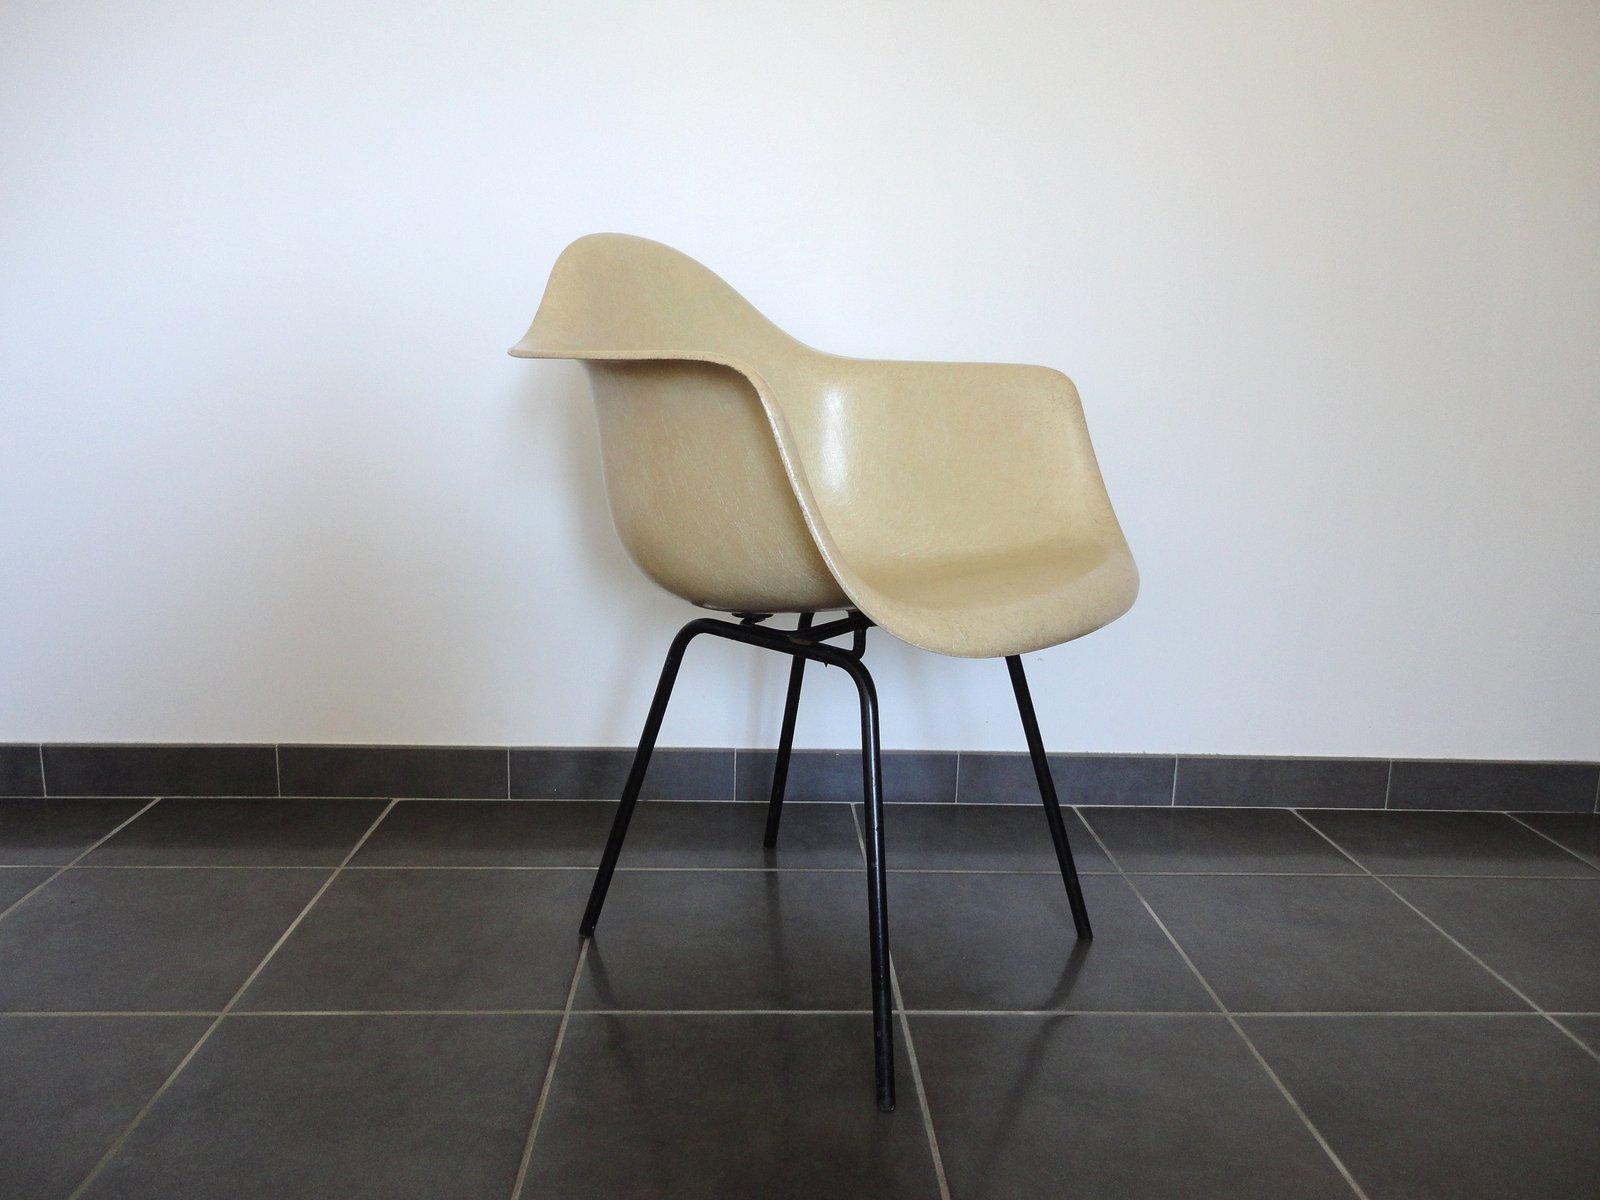 glasfaser sessel von charles ray eames f r herman miller 1950er bei pamono kaufen. Black Bedroom Furniture Sets. Home Design Ideas